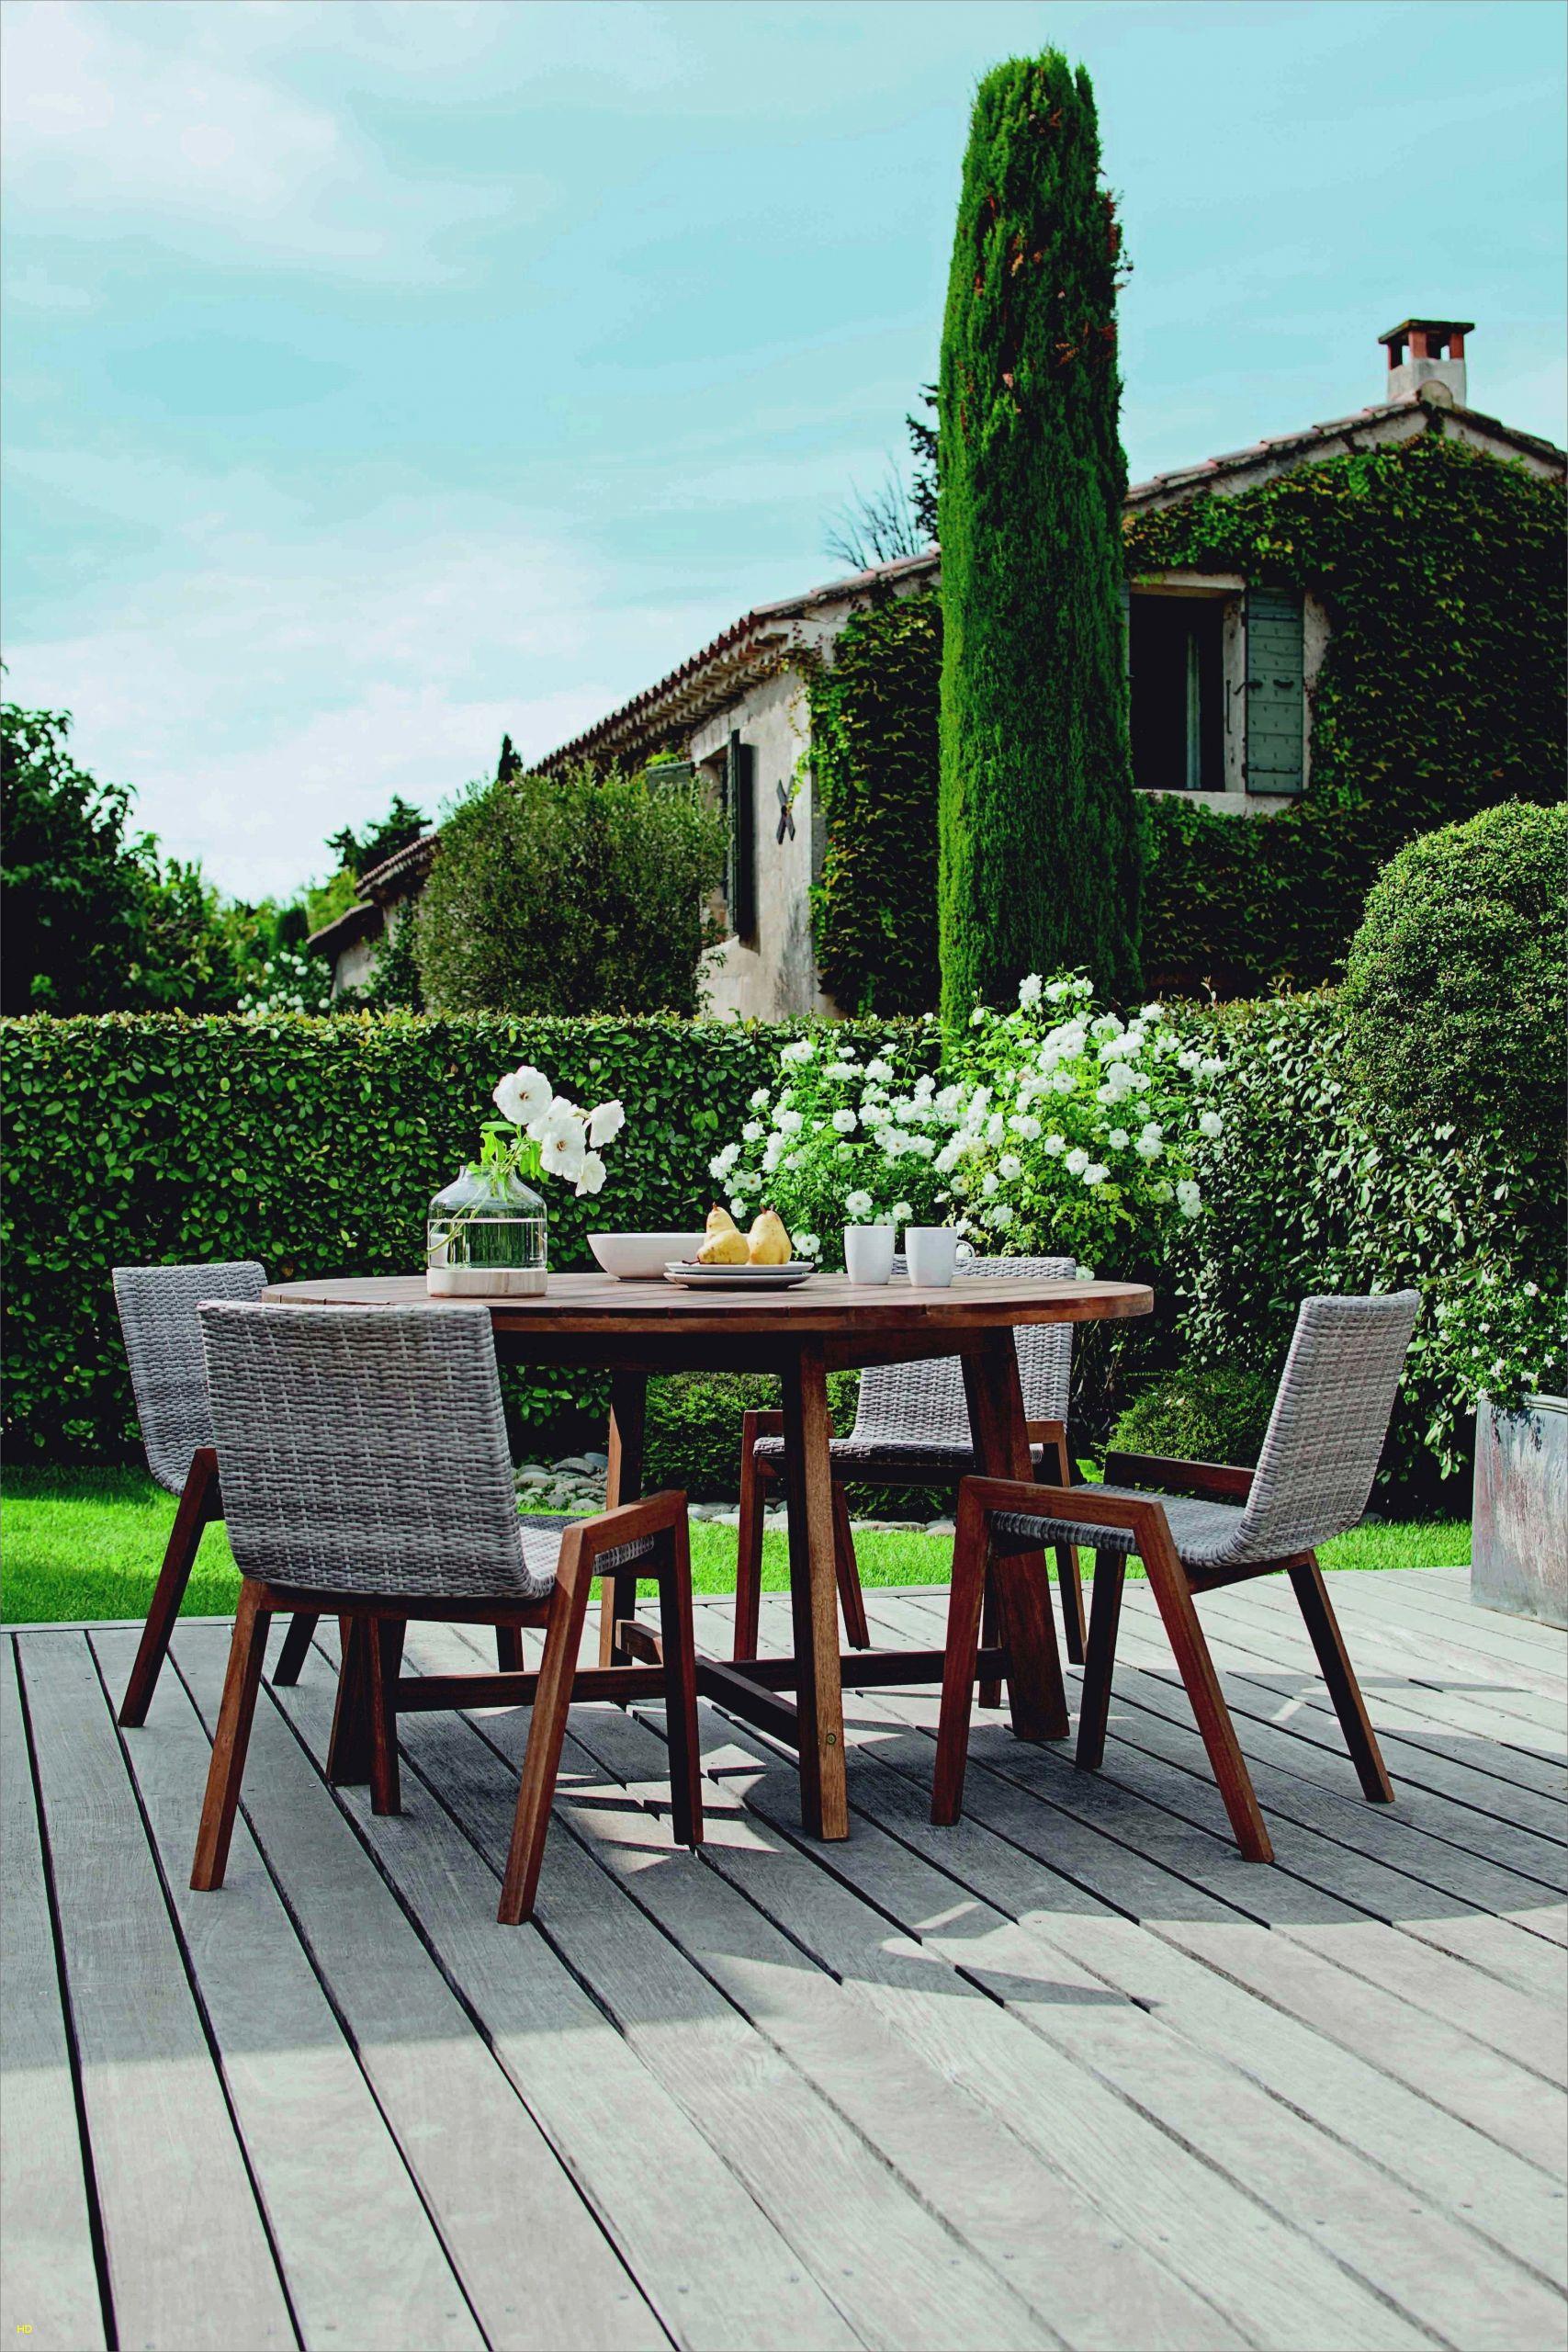 Solde Salon Jardin Best Of Salon De Jardin Leclerc Catalogue ... encequiconcerne Mobilier De Jardin Leclerc